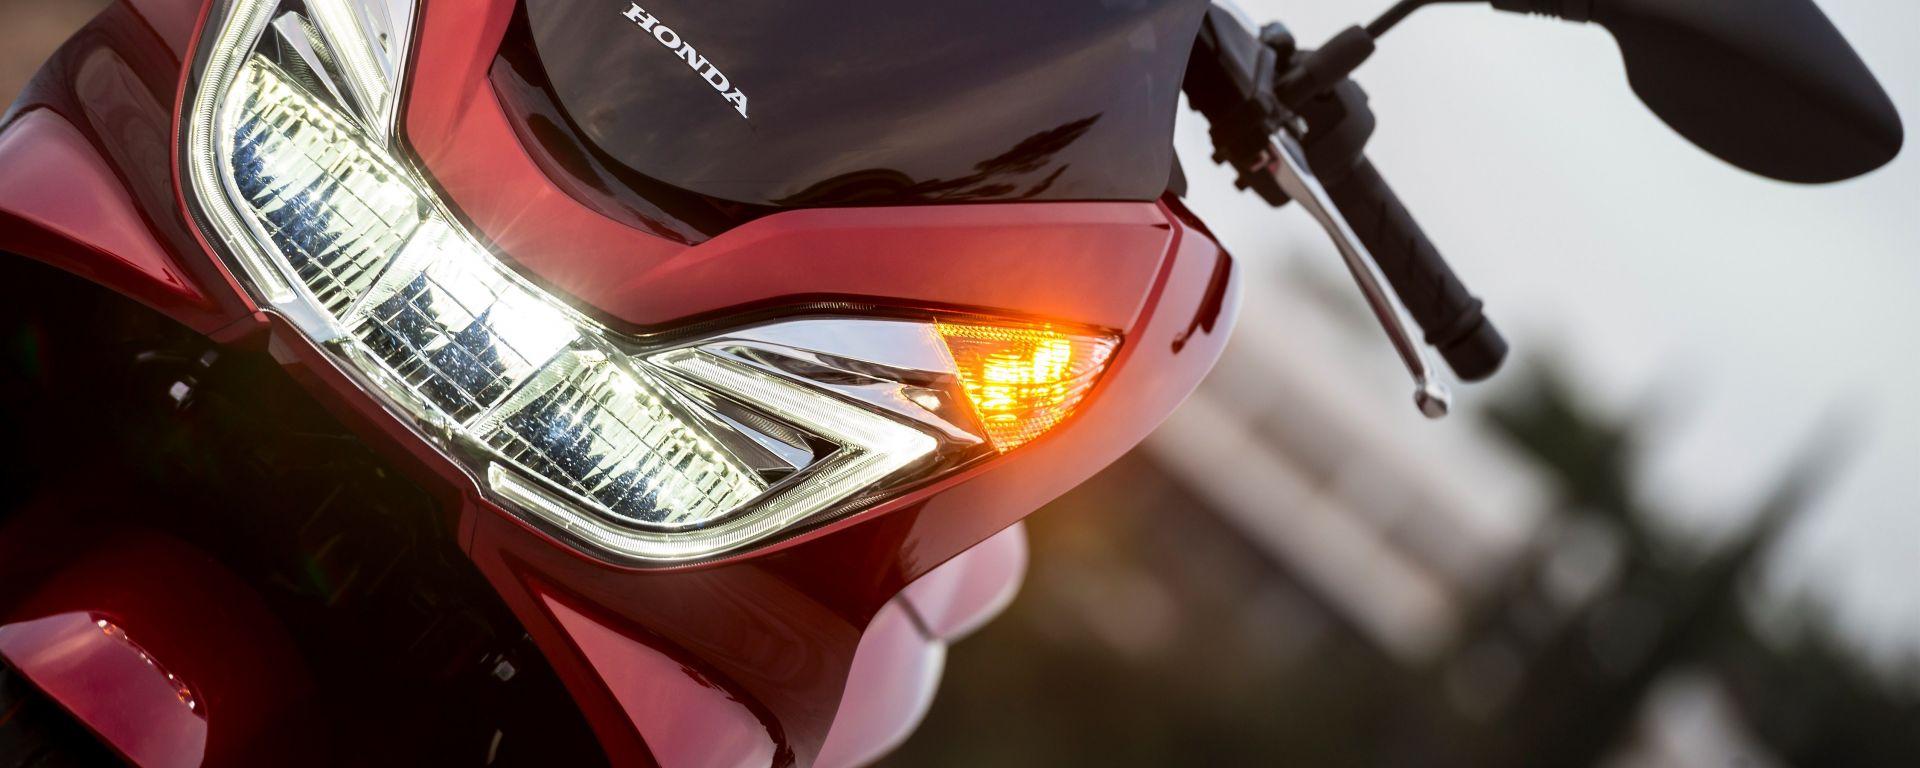 Honda PCX 125 2017, ora è Euro 4